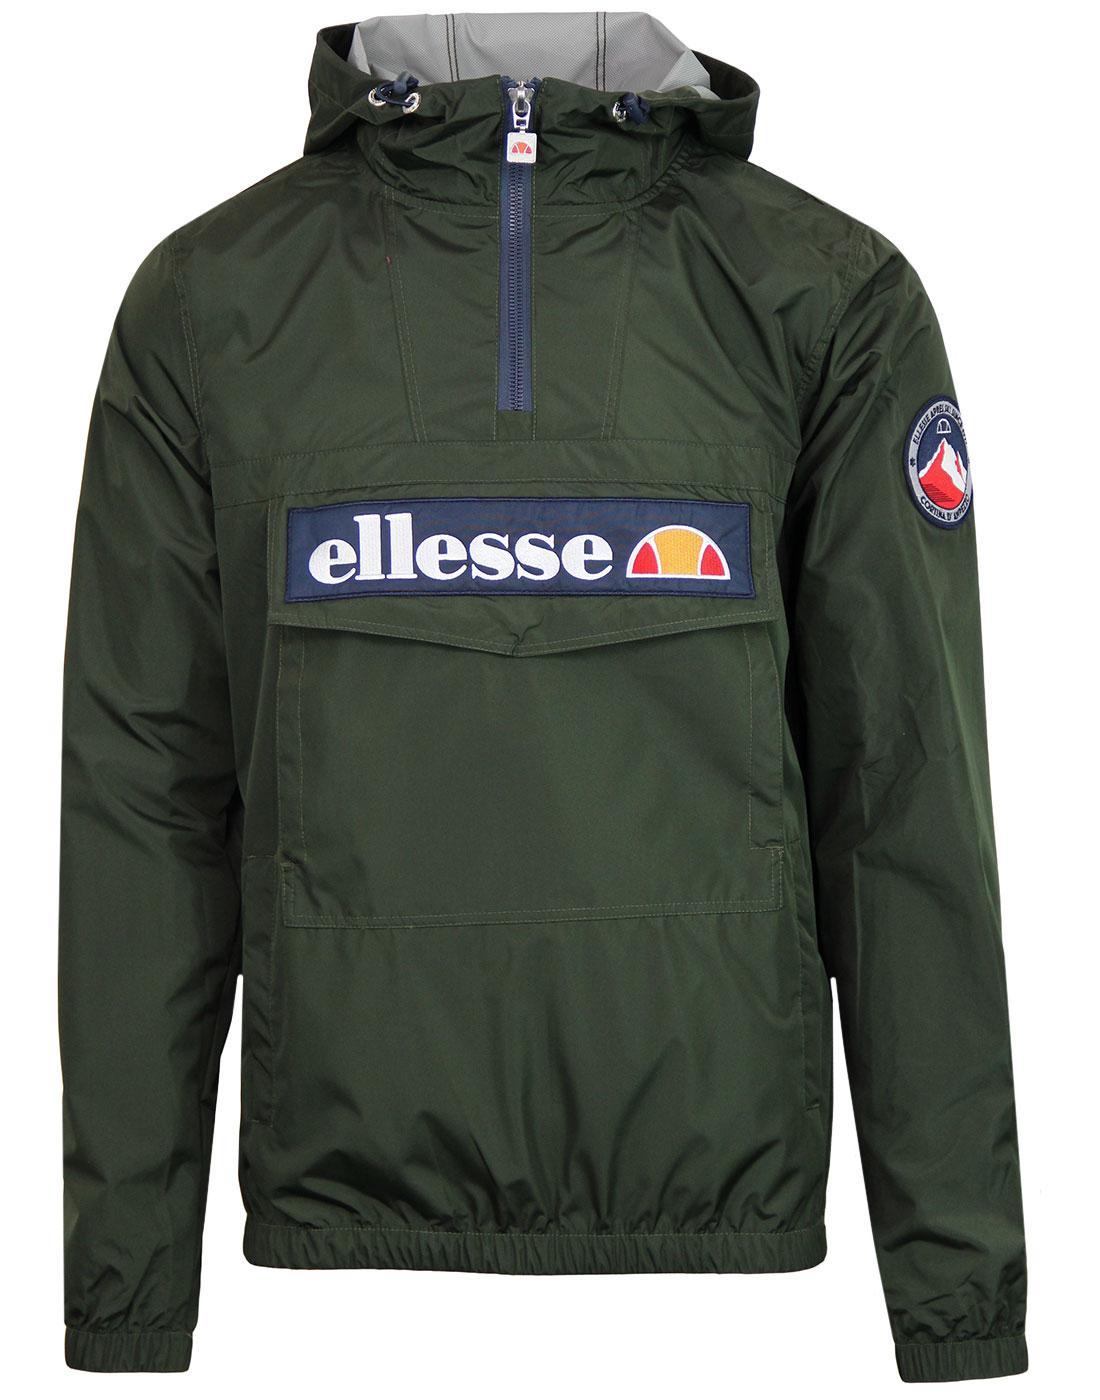 ELLESSE Women's Retro Oversize Overhead Jacket (R)